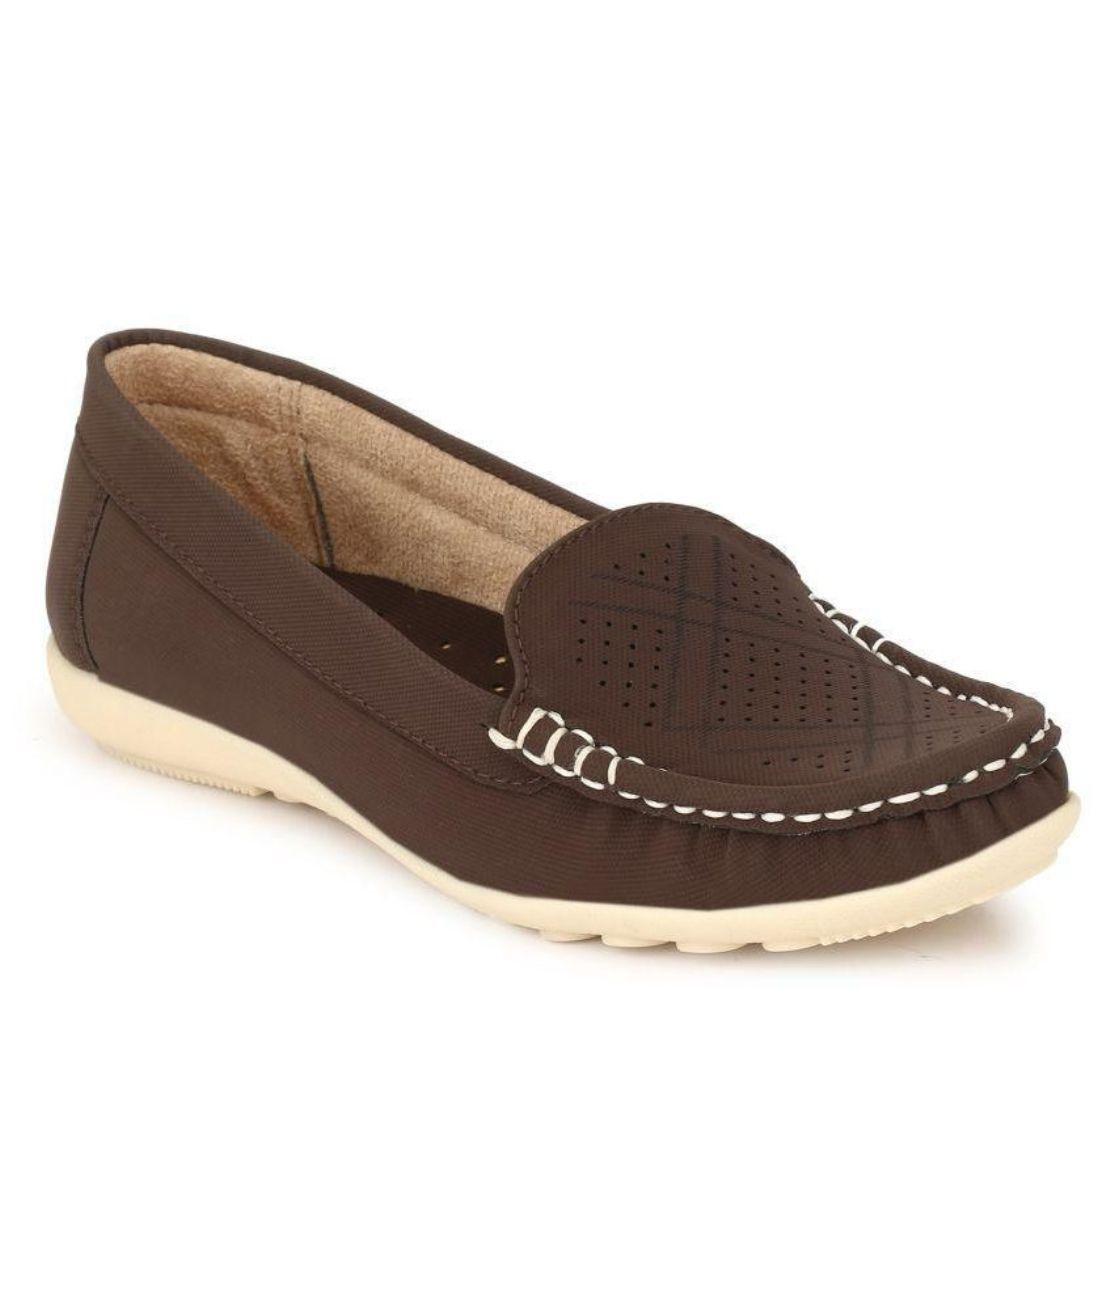 Rimezs Brown Casual Shoes